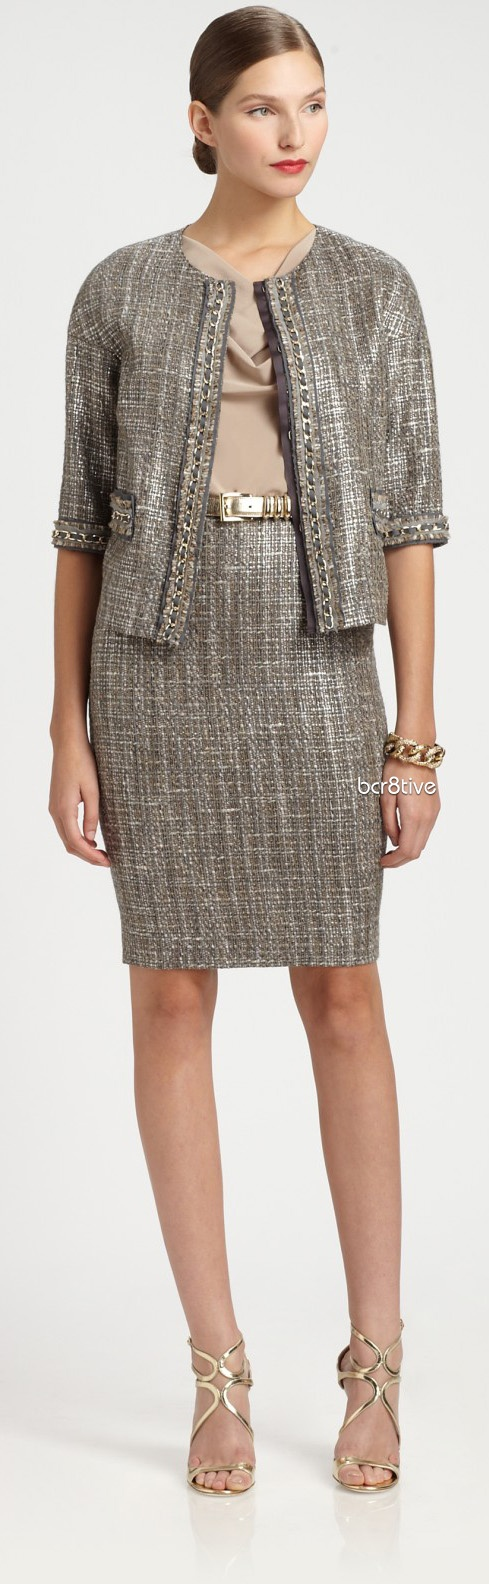 St. John Metallic Tweed Skirt on Sax 5th Avenue